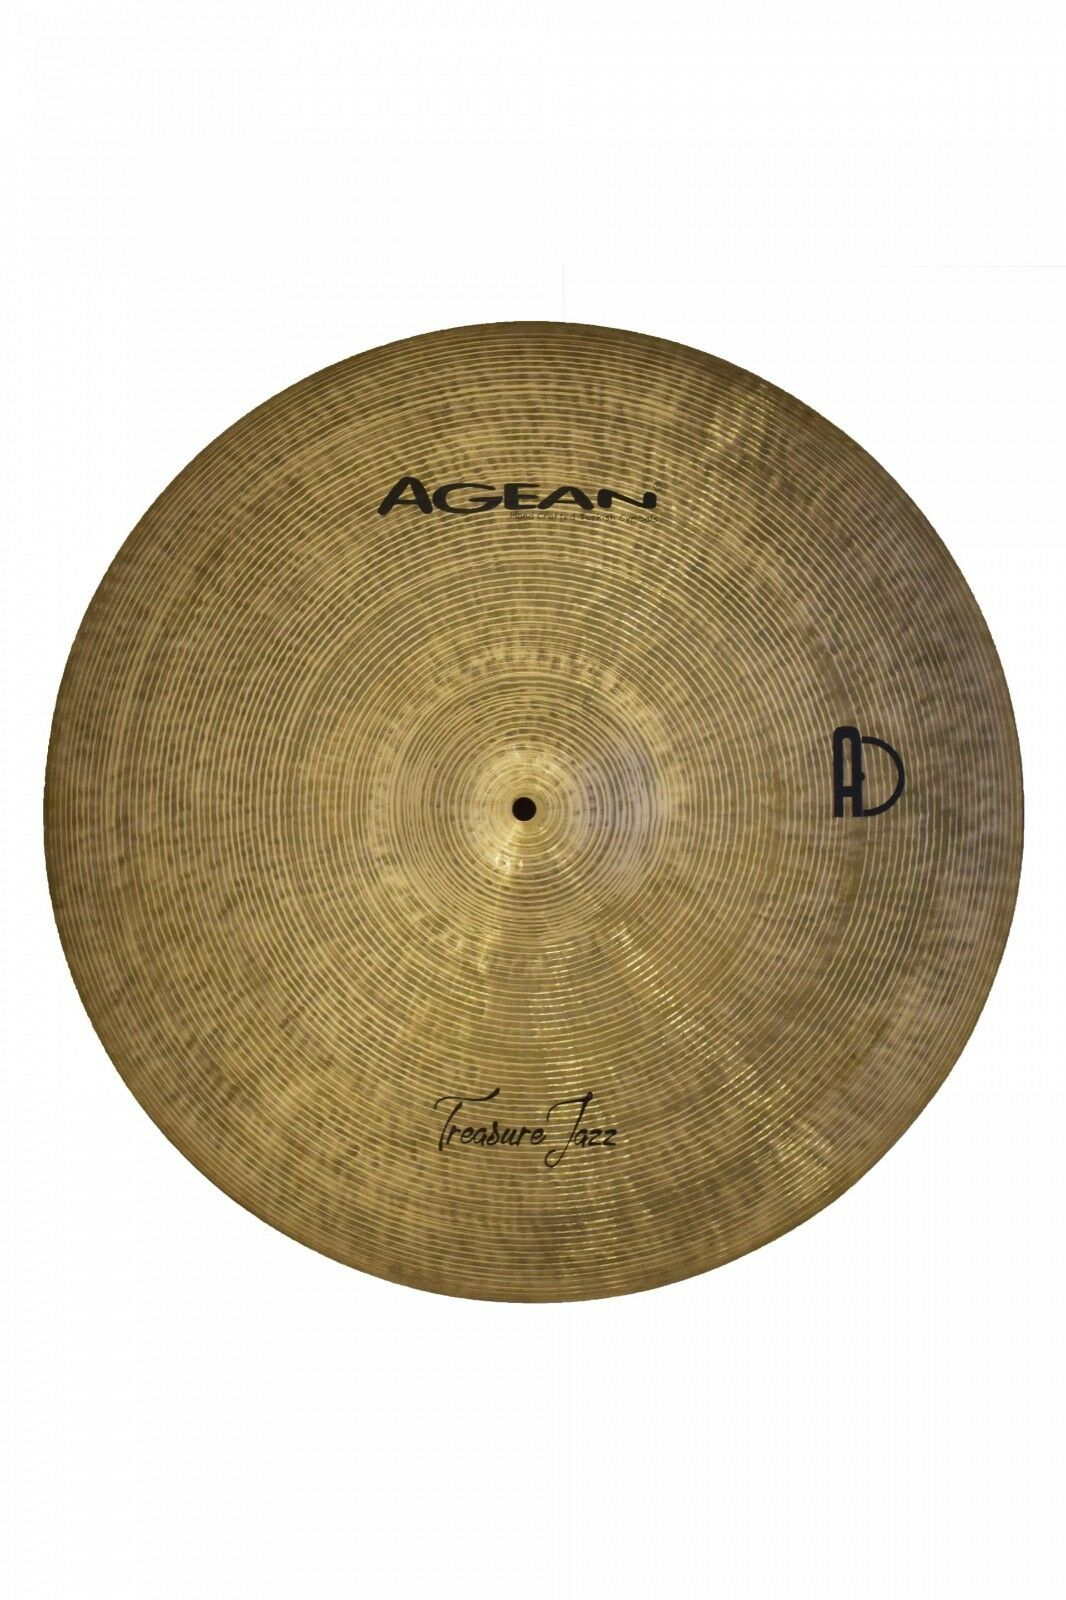 Agean Cymbals 19-inch Treasure Jazz Ride Medium